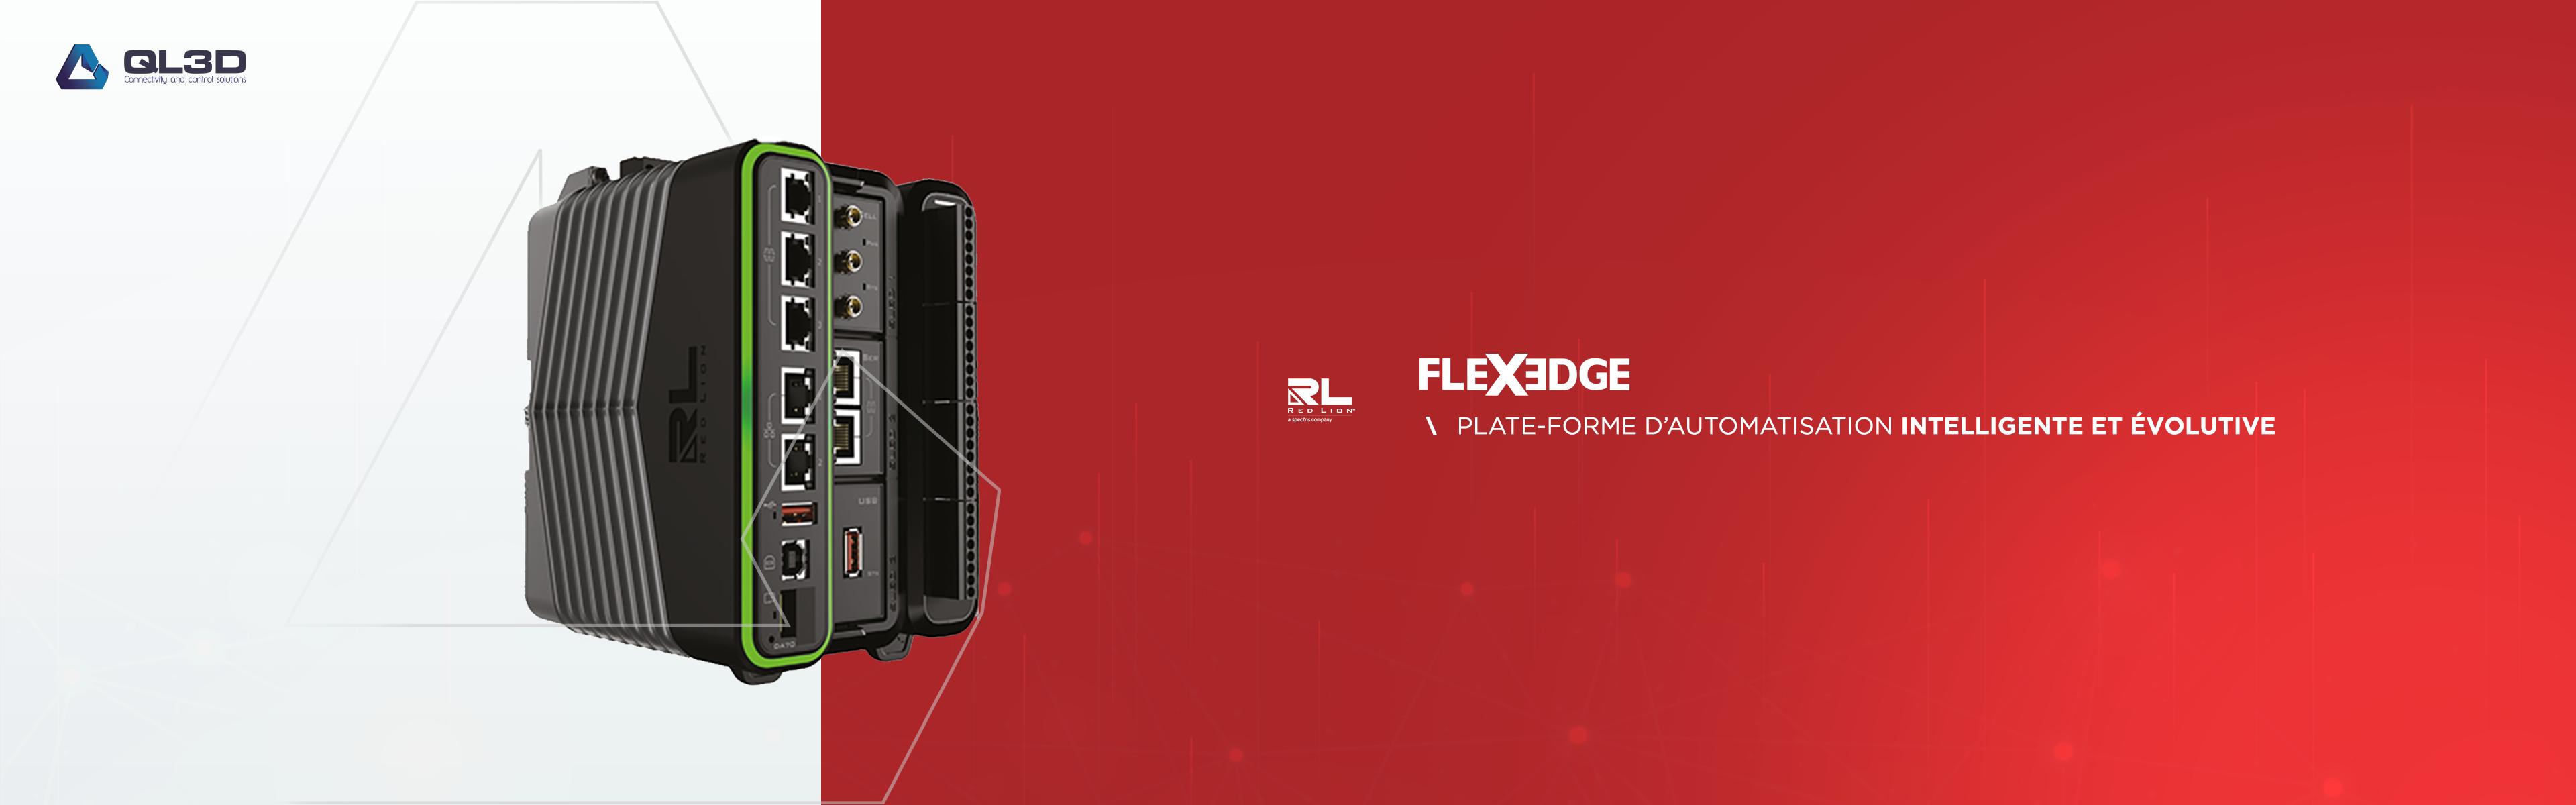 Red Lion FlexEdge